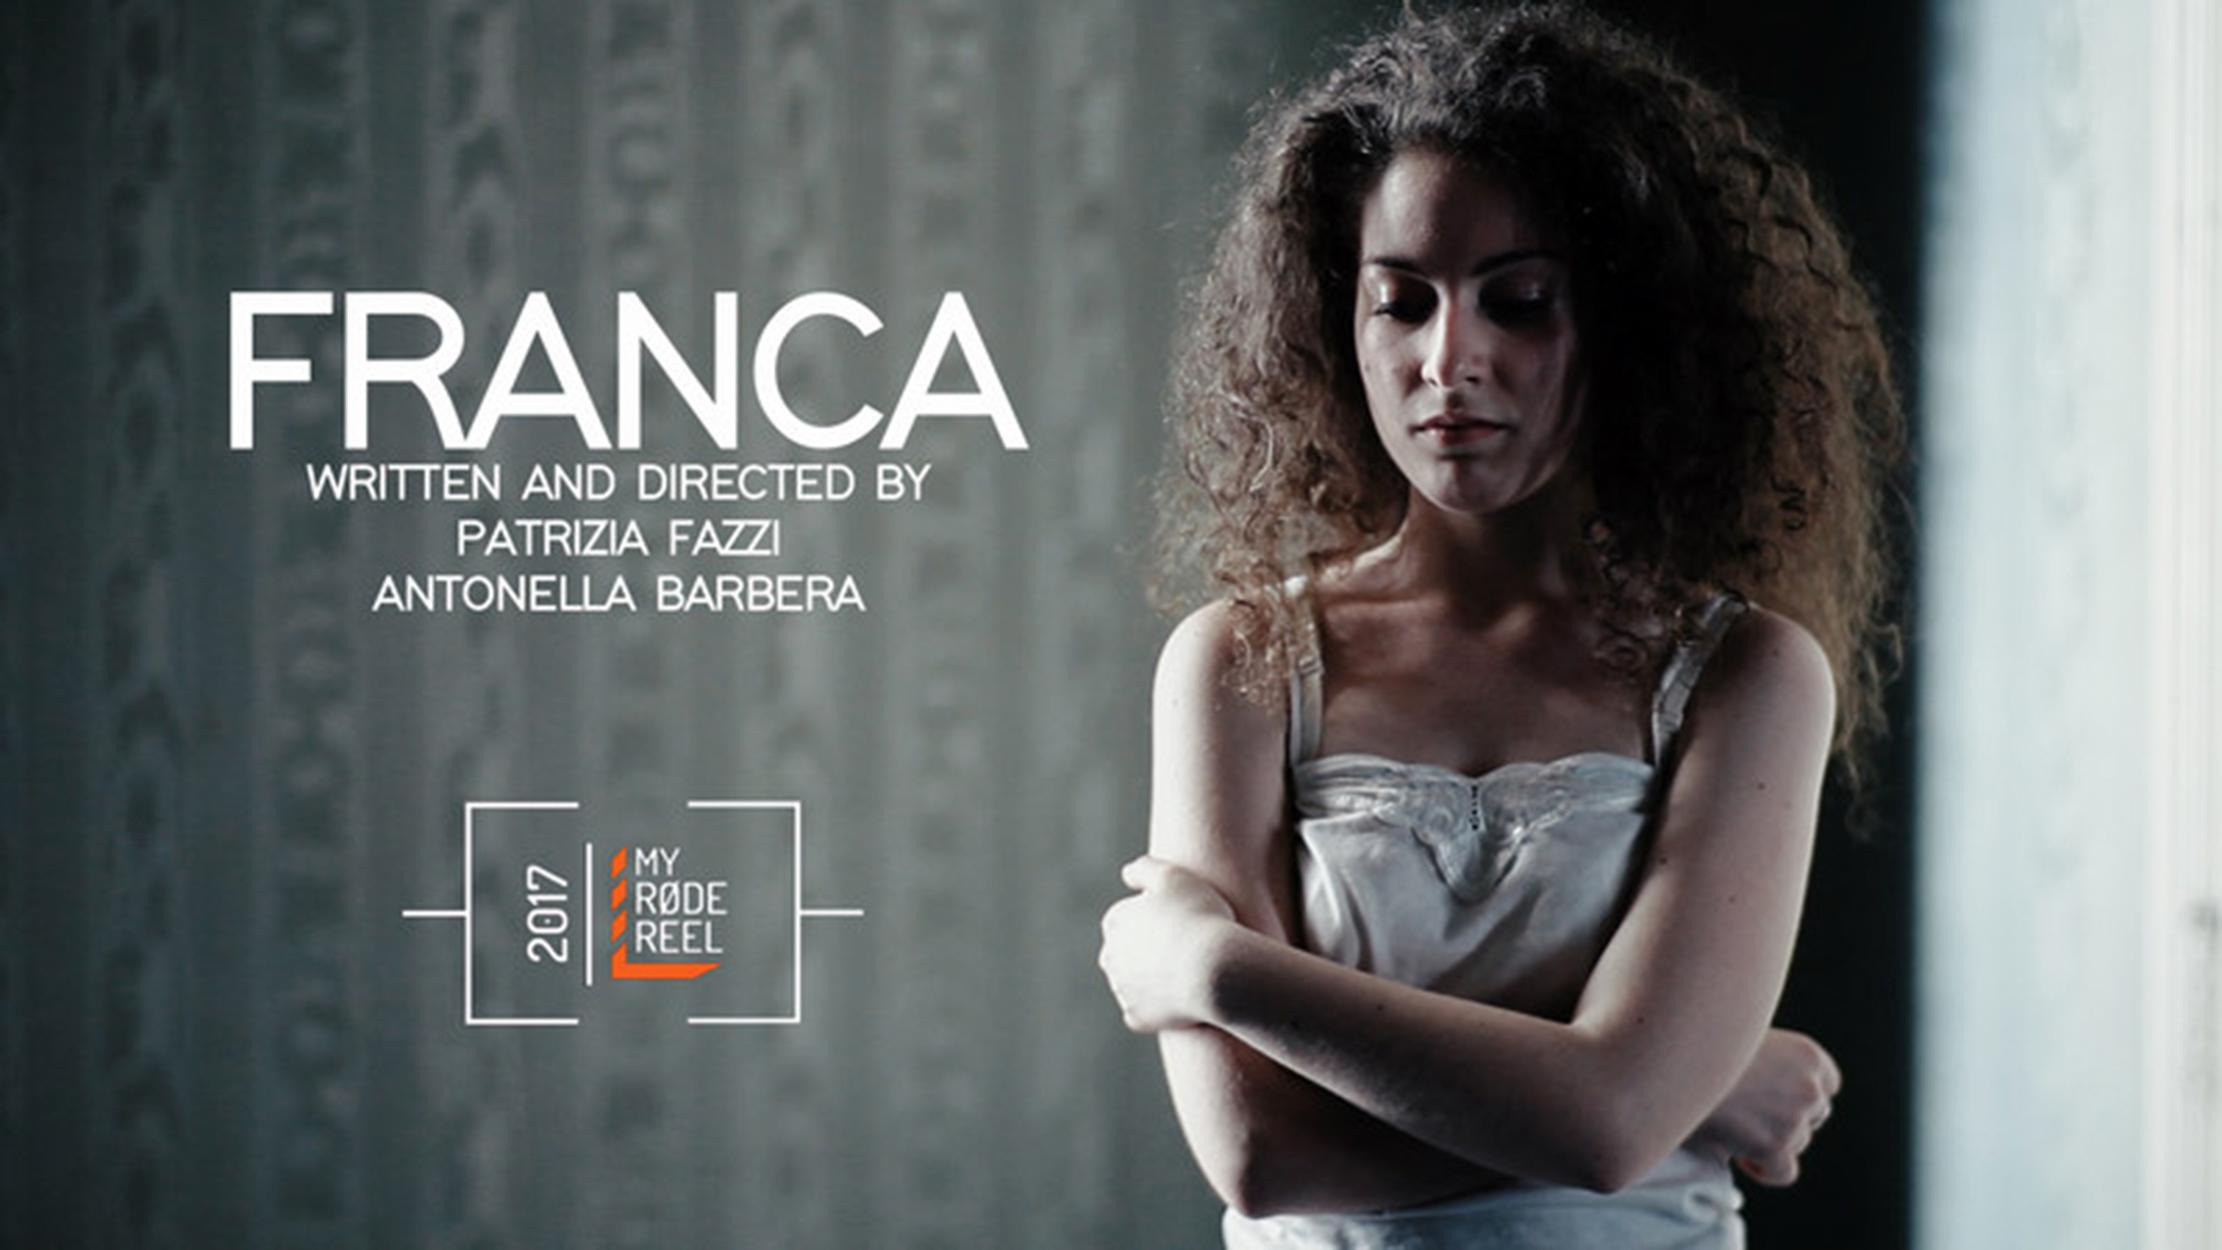 Antonella barbera galleries 36